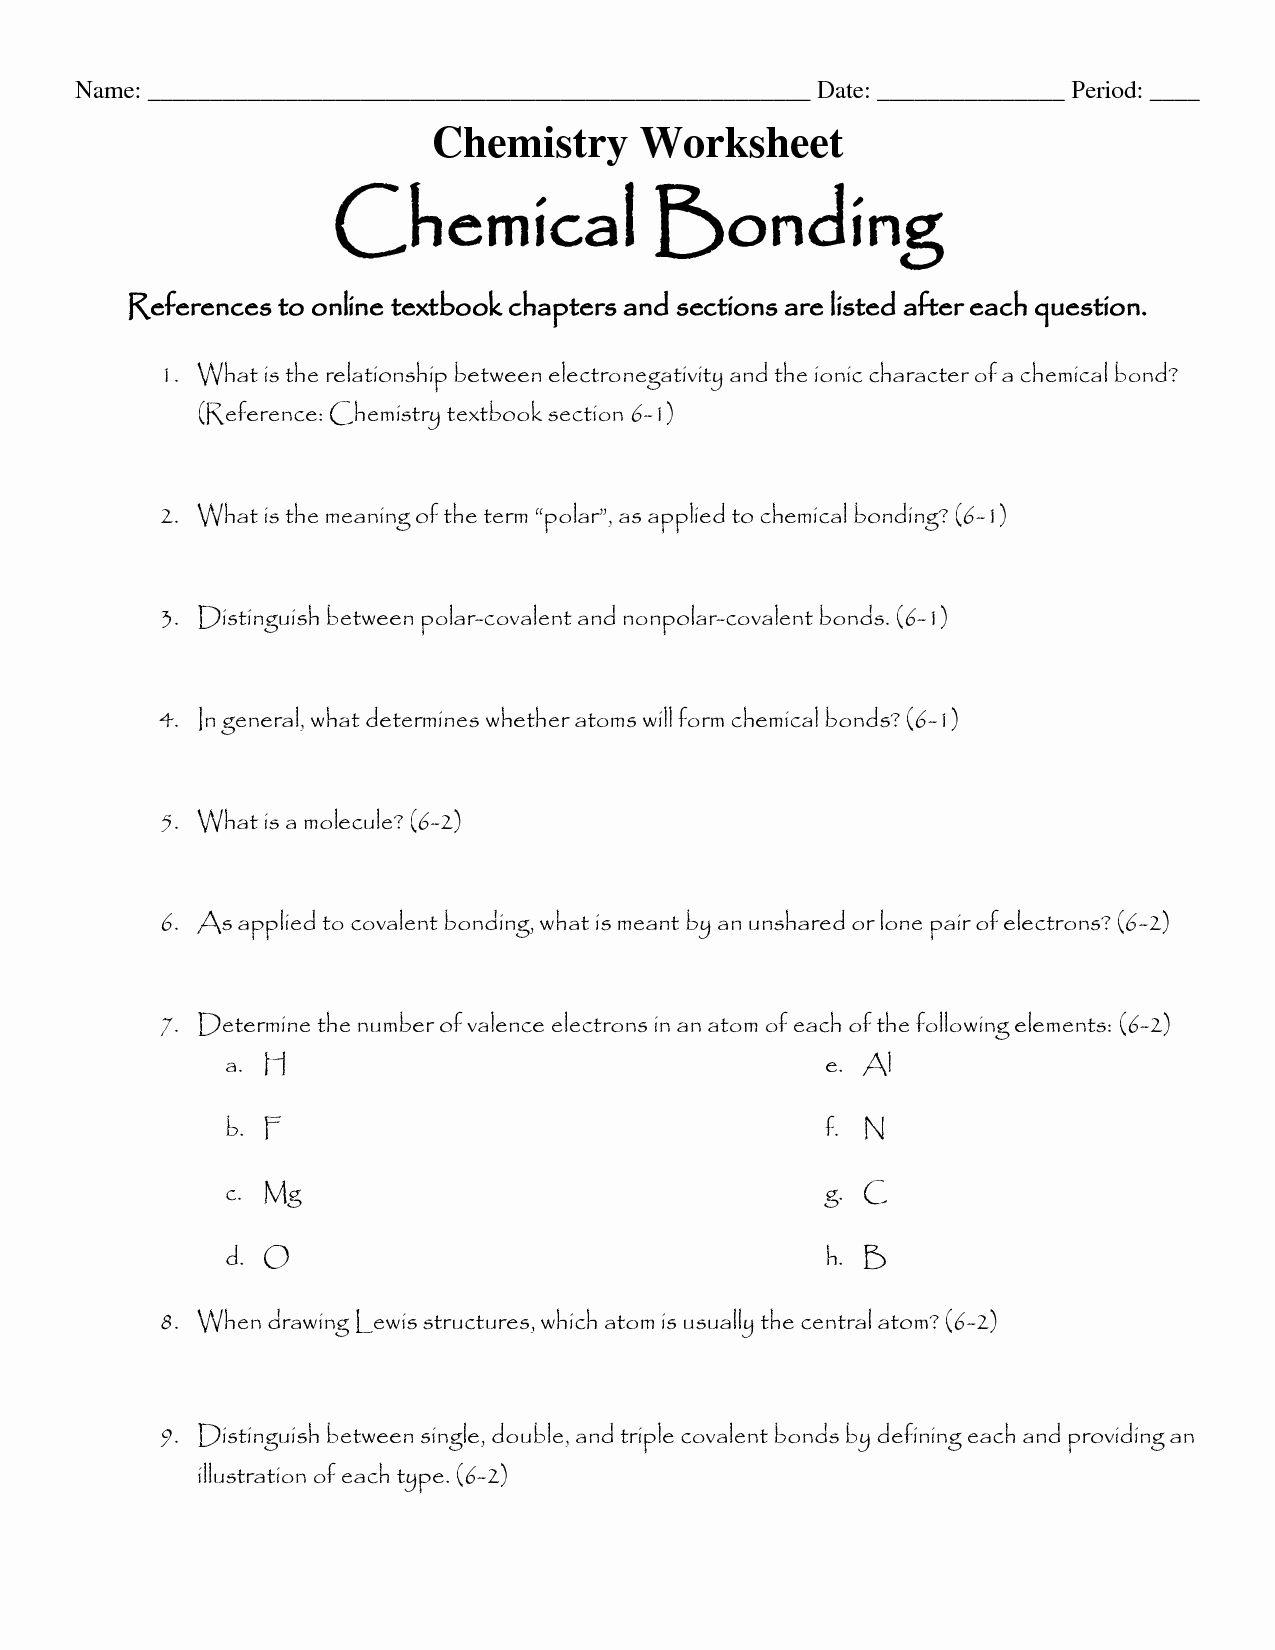 Chemical Bonding Worksheet Key Unique 16 Best Of Types